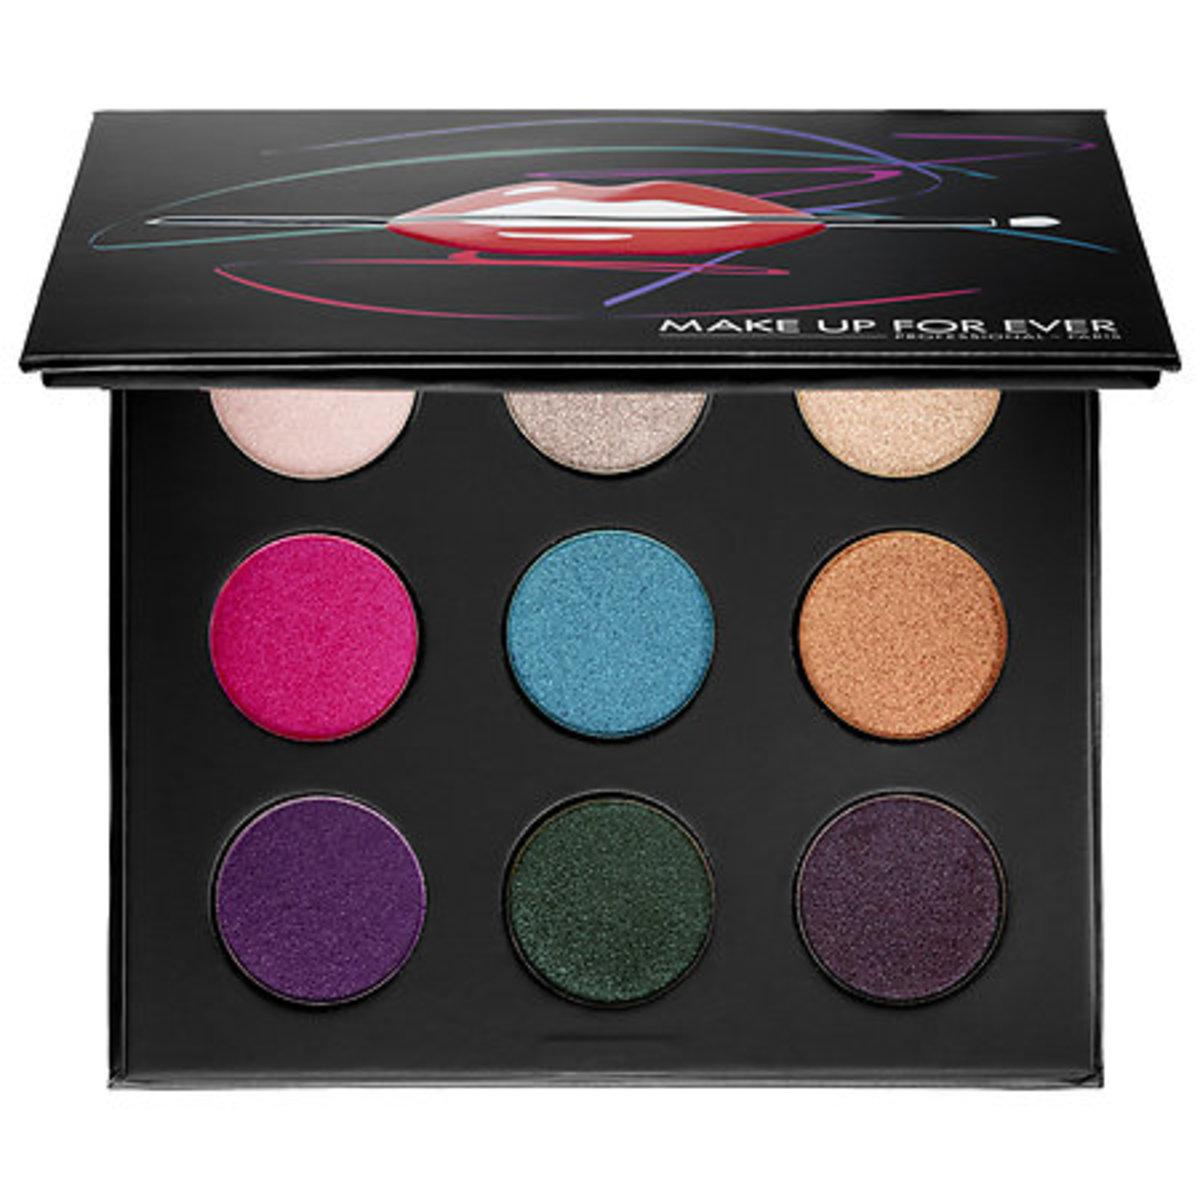 Make Up For Ever Artist Palette Volume 2 Artistic